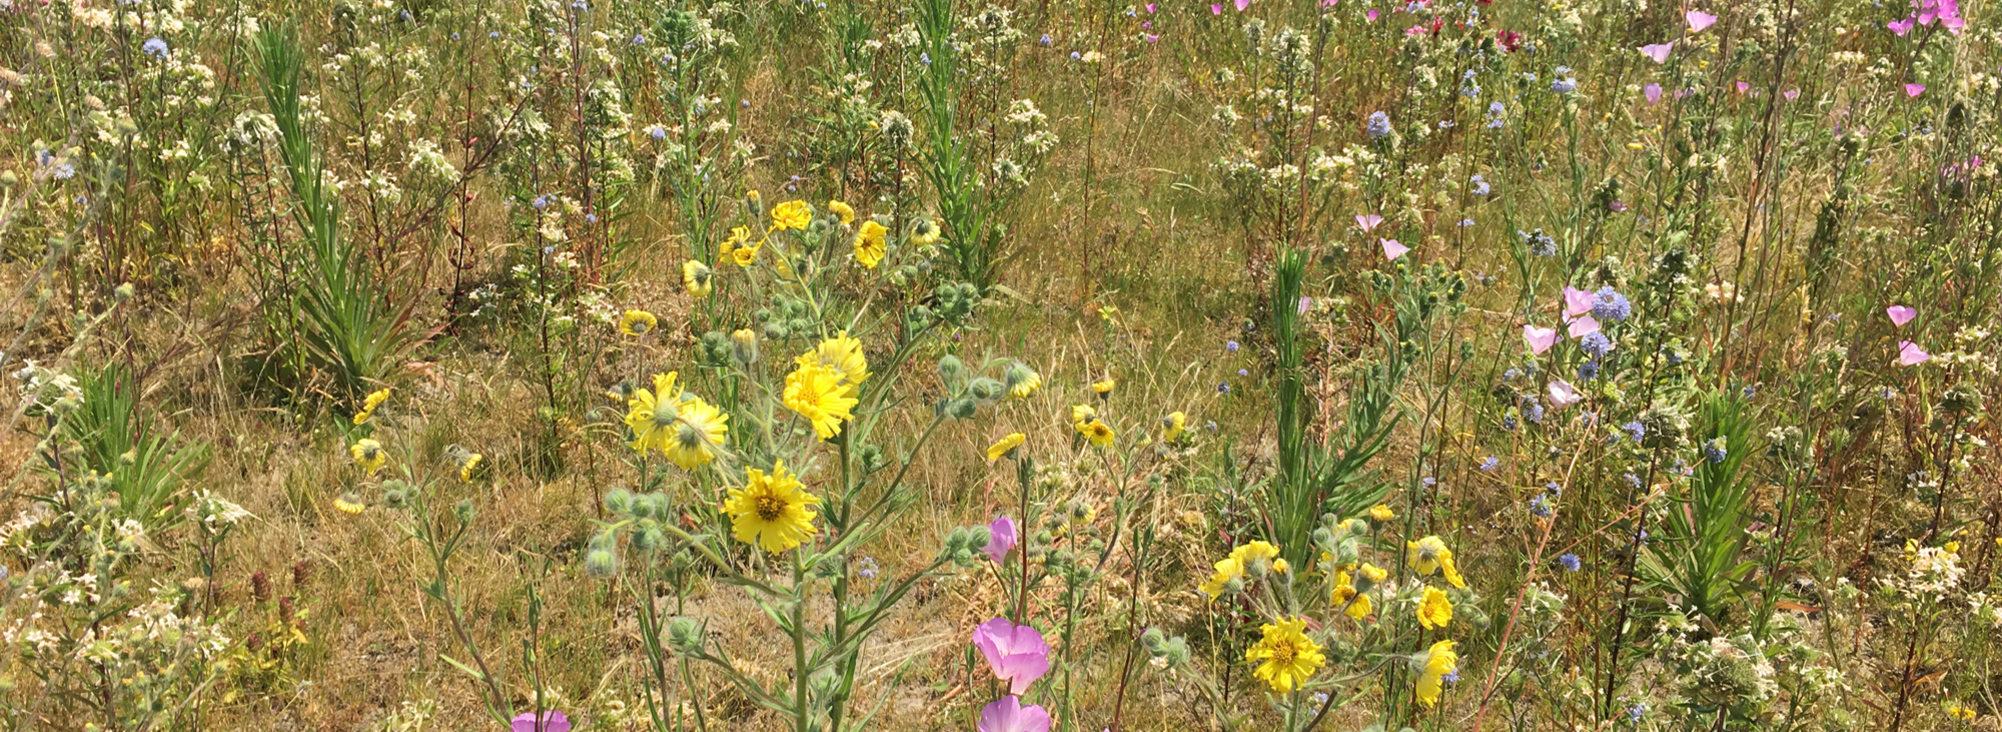 field of wildflowers at St. Johns Prairie